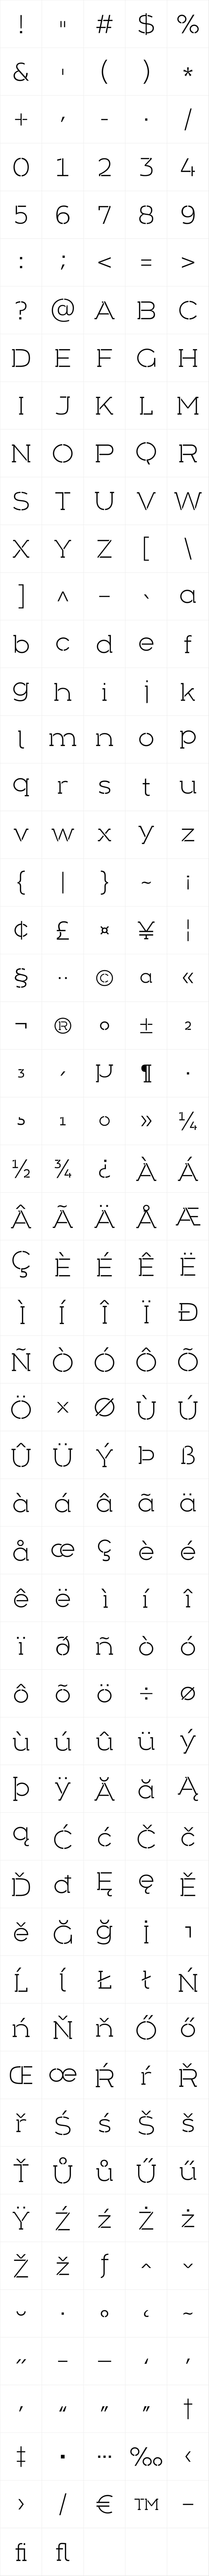 Arkibal Serif Stencil Light